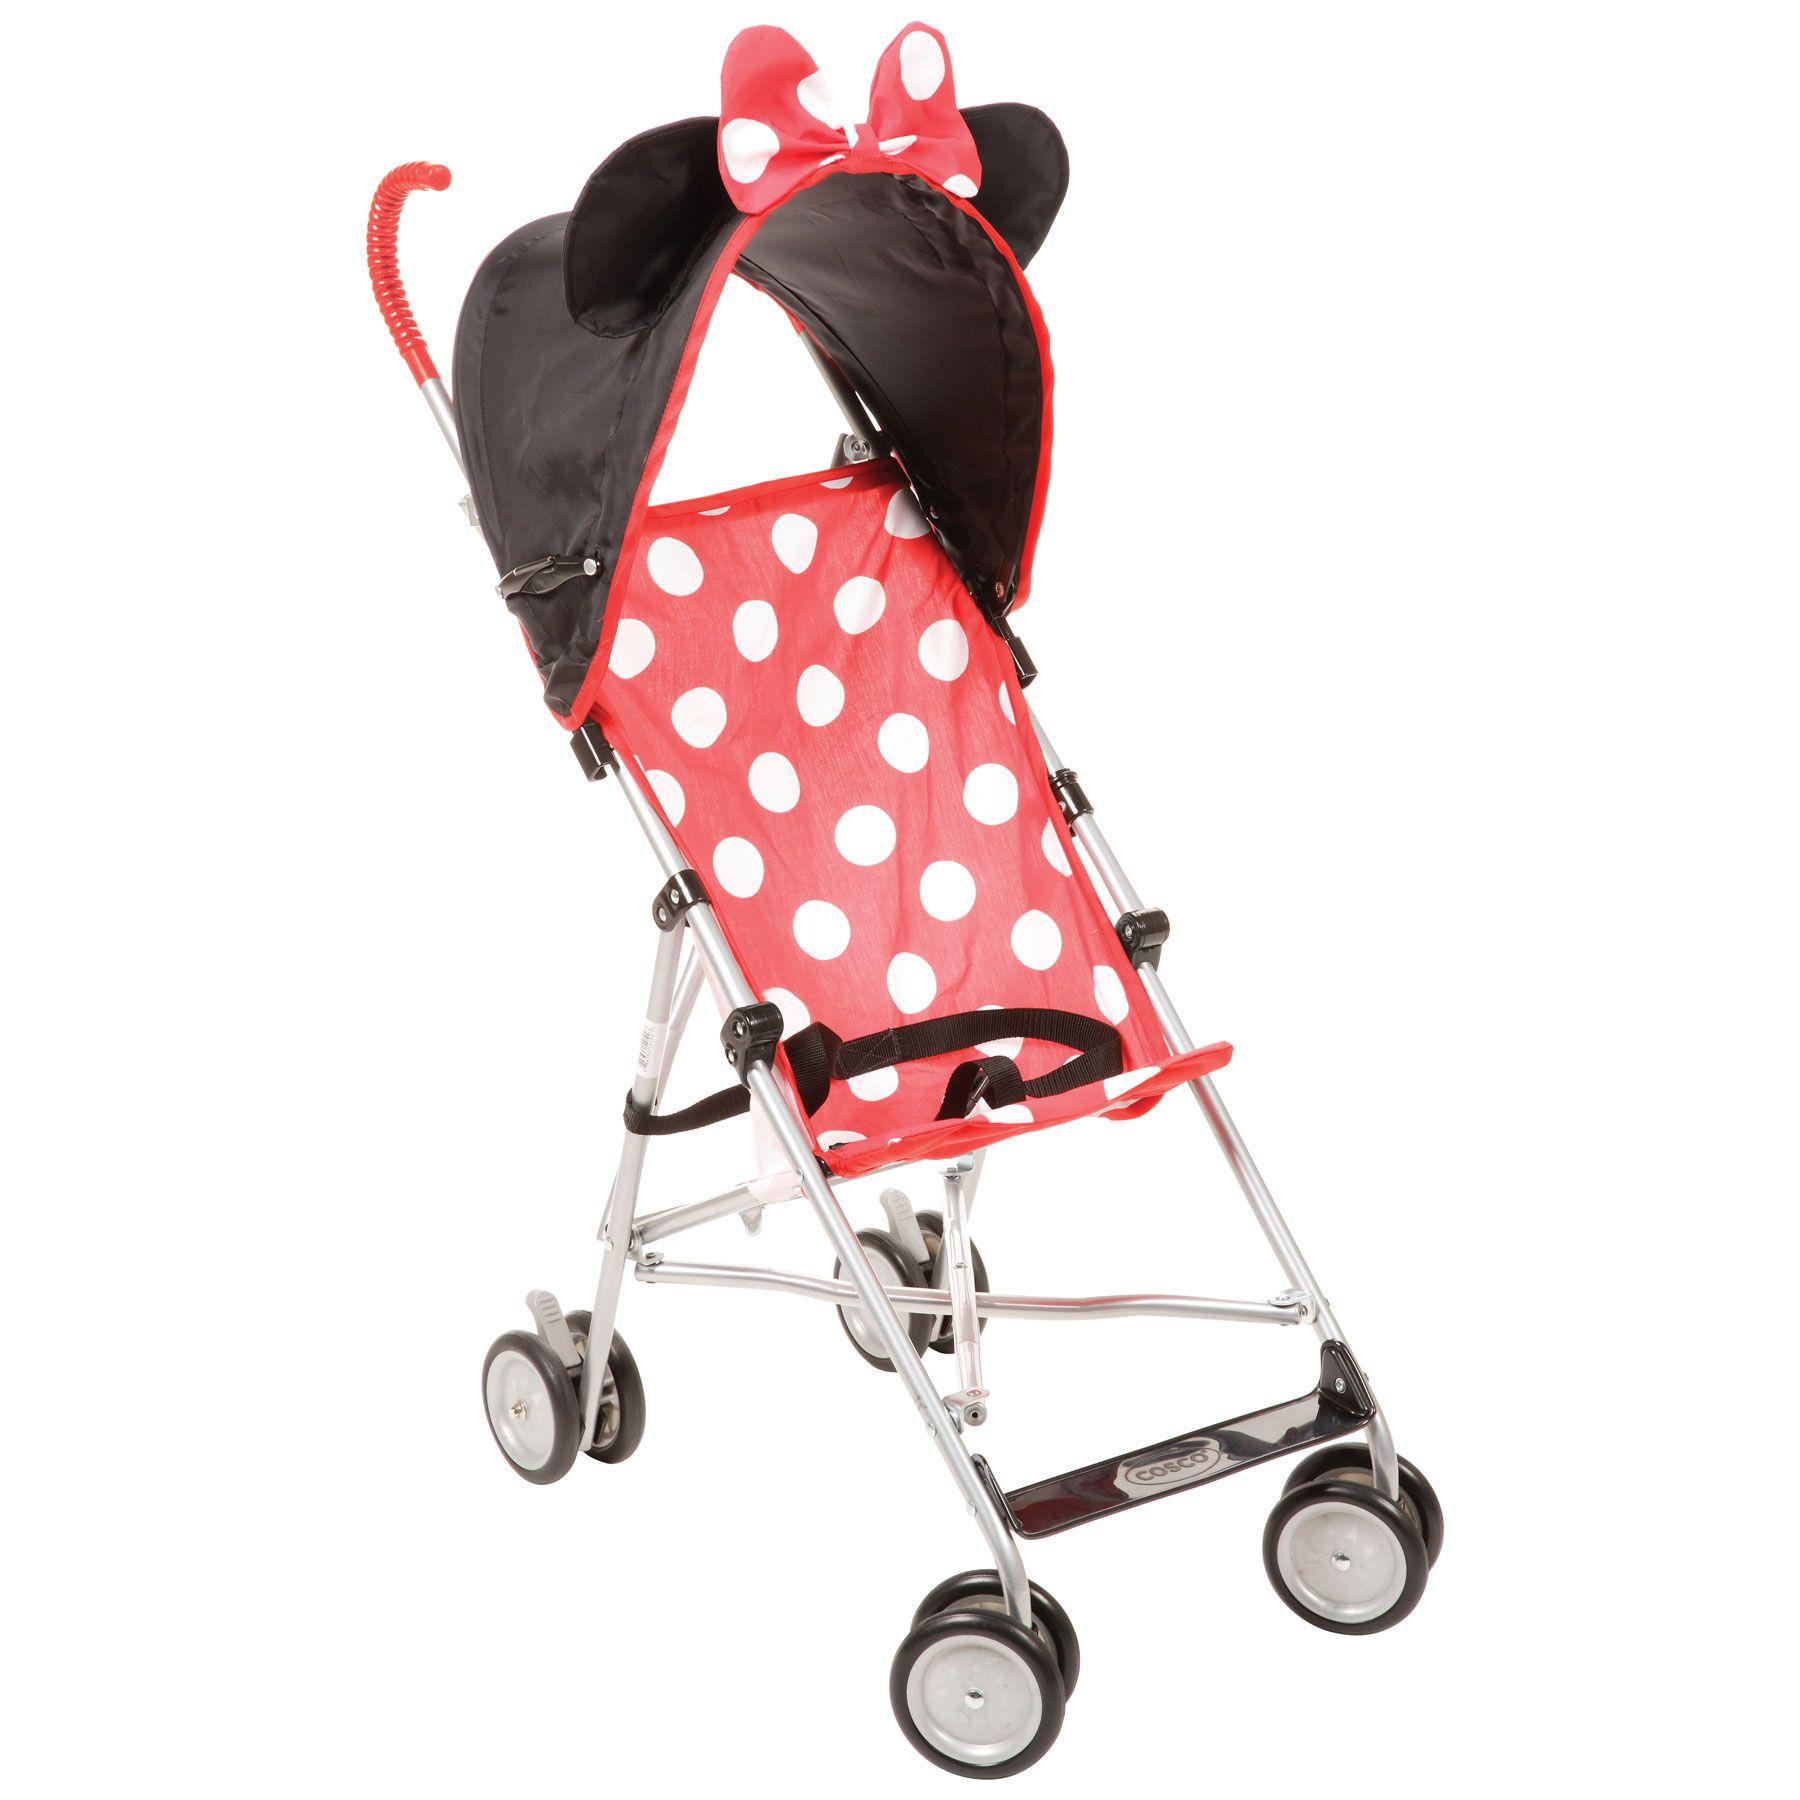 MICKEY MOUSE Dress Up Comfort Height Umbrella Stroller